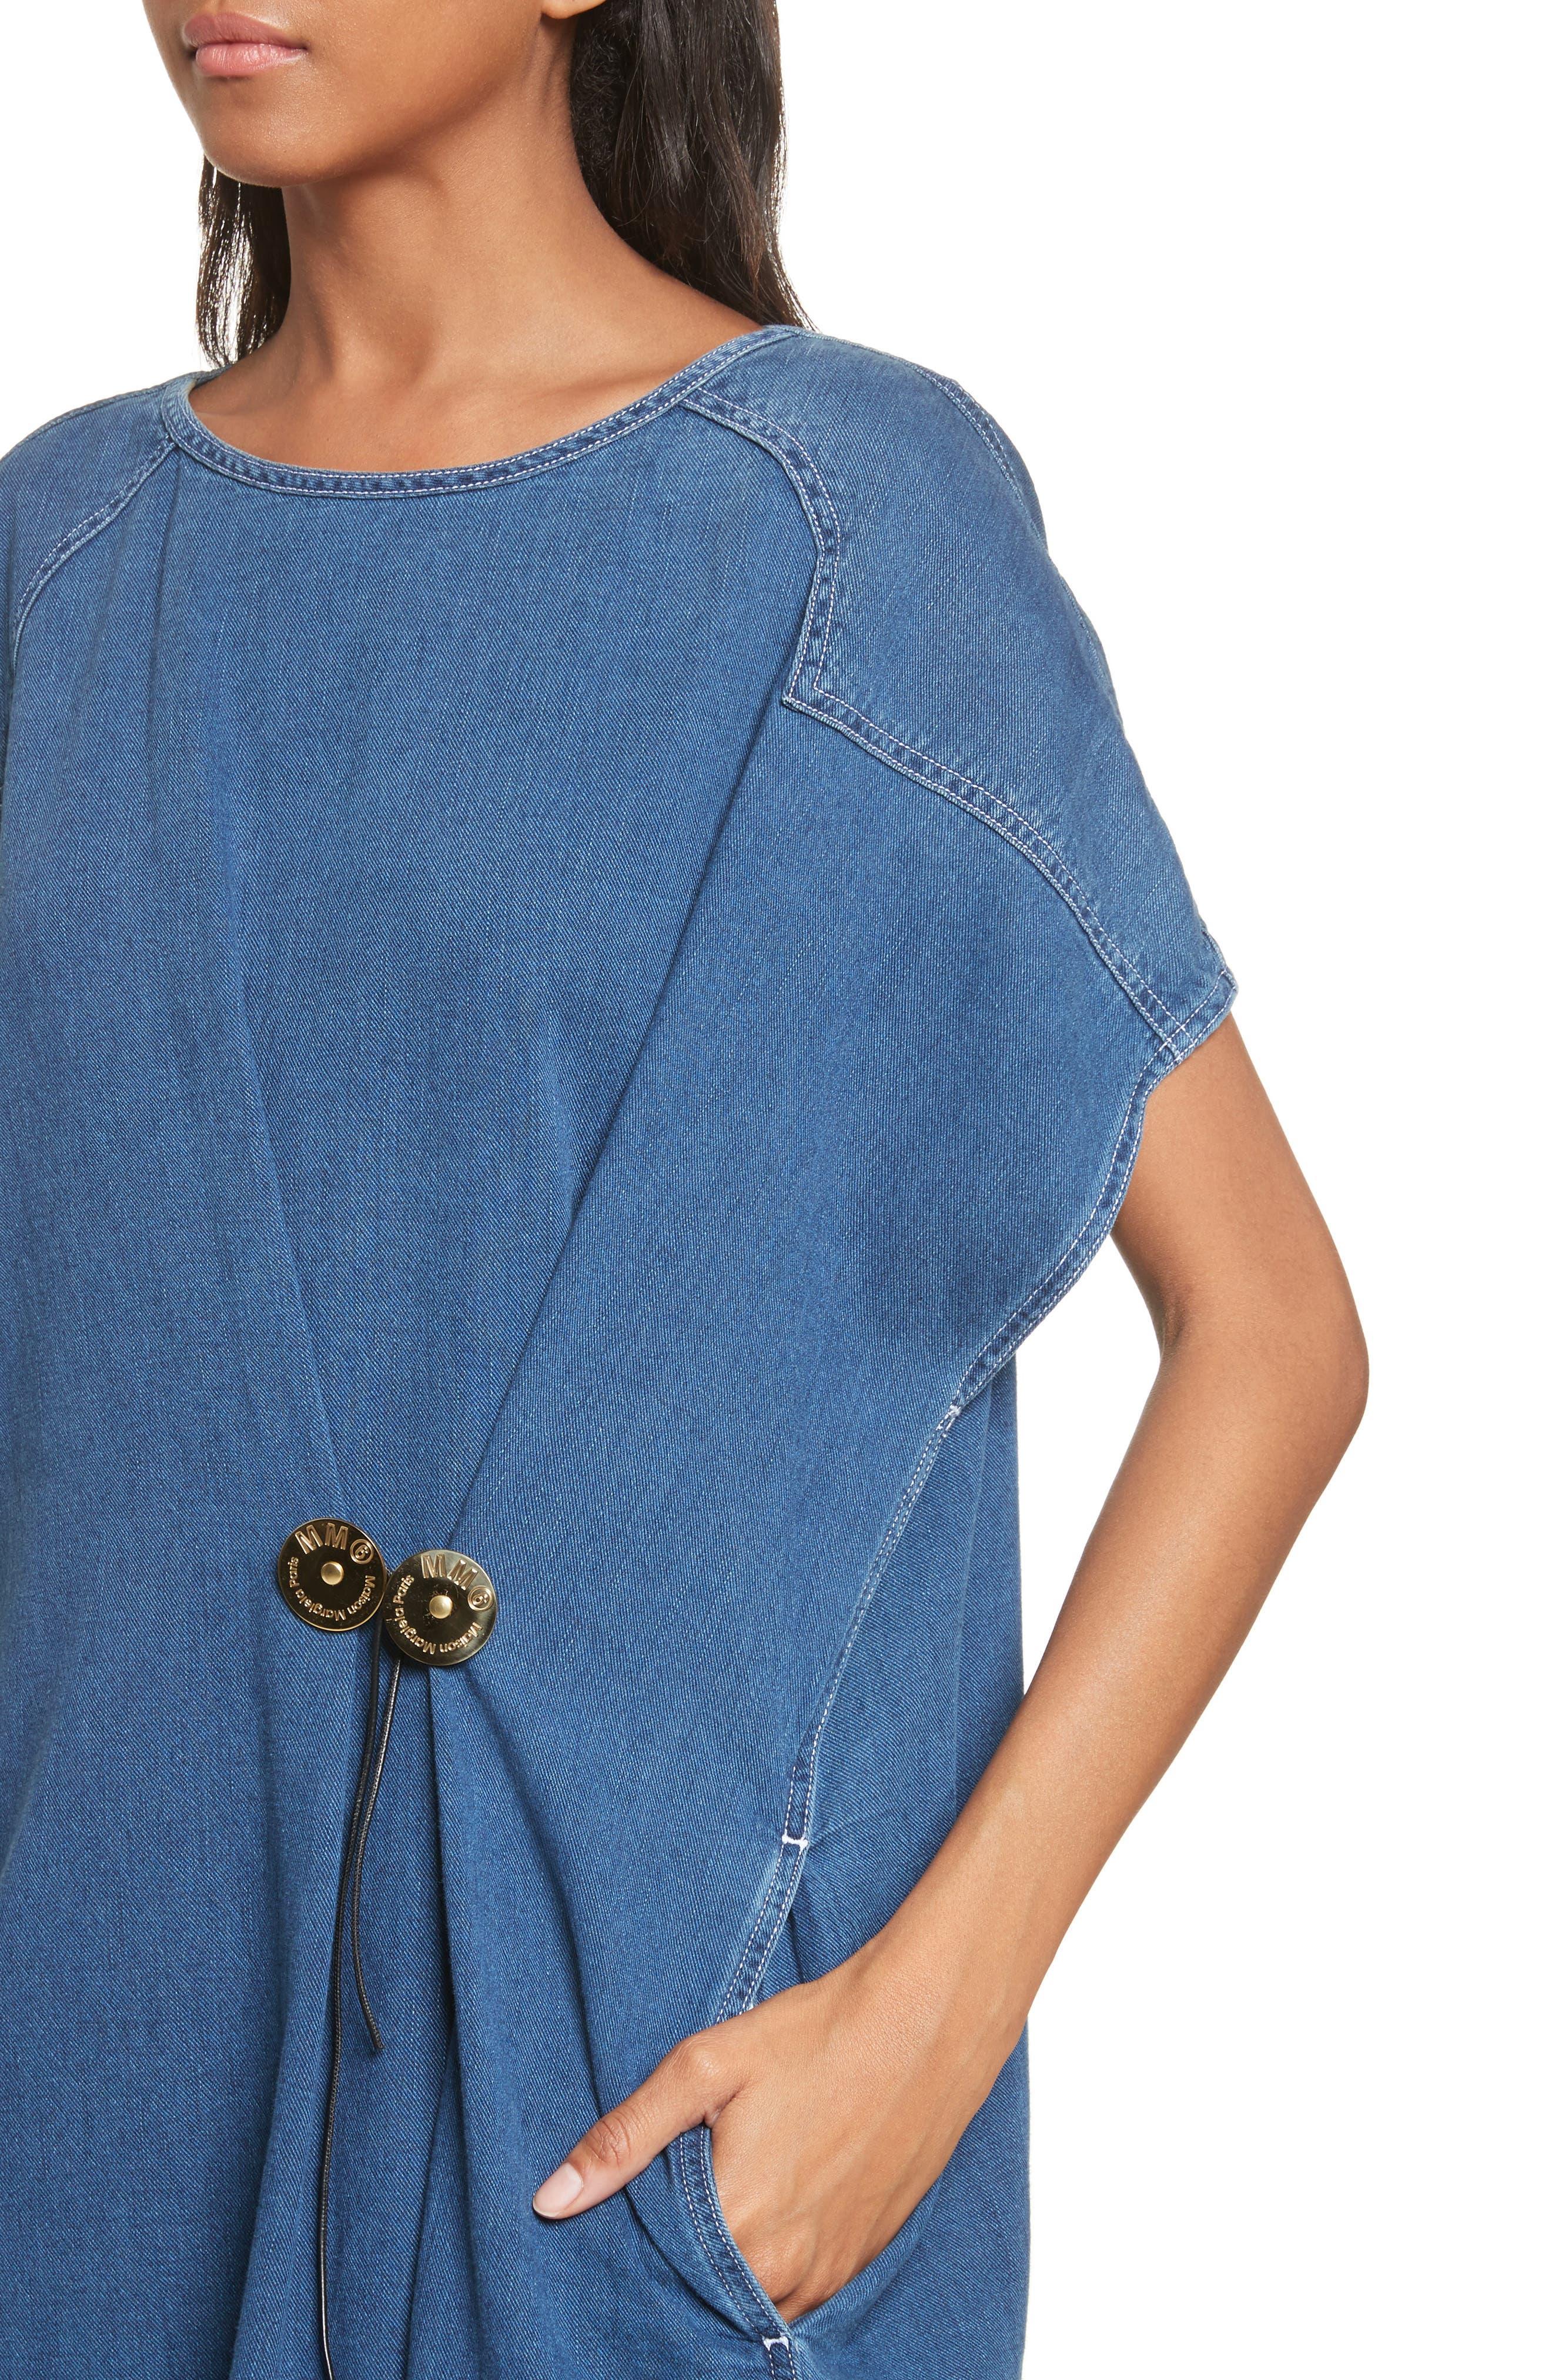 '80s Wash Denim Dress,                             Alternate thumbnail 4, color,                             Medium Blue